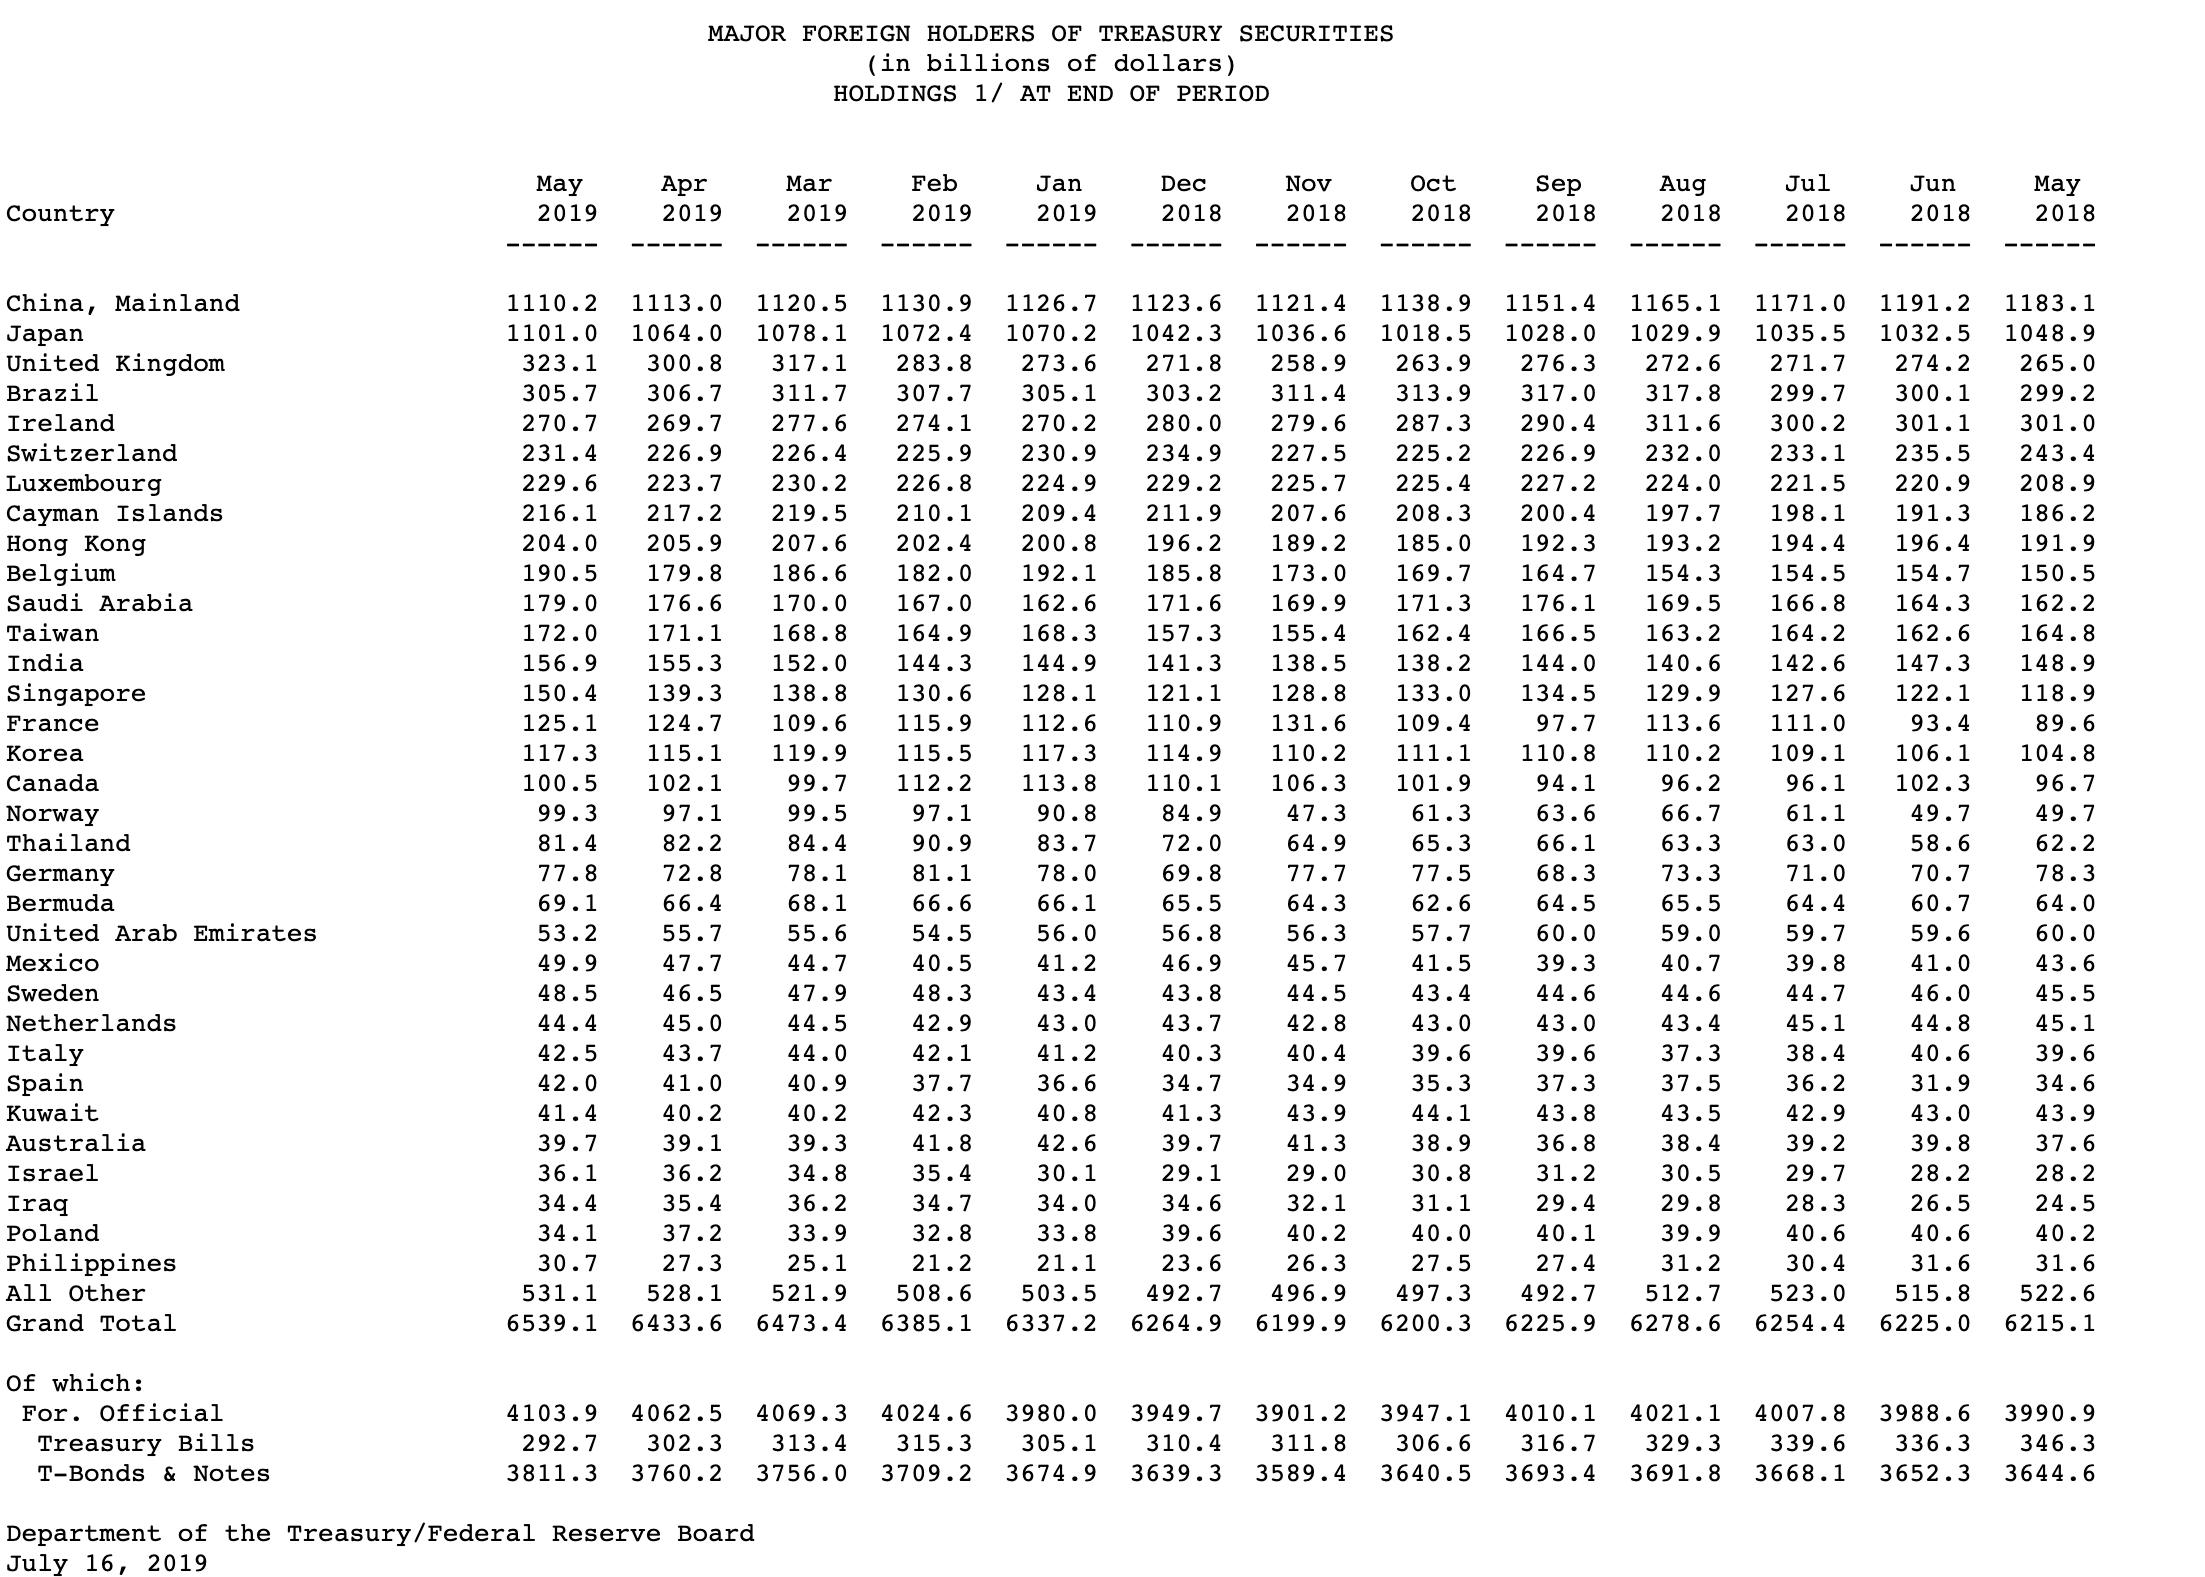 US Treasury-Liste - US-Staatsanleihen ausländische Halter Mai